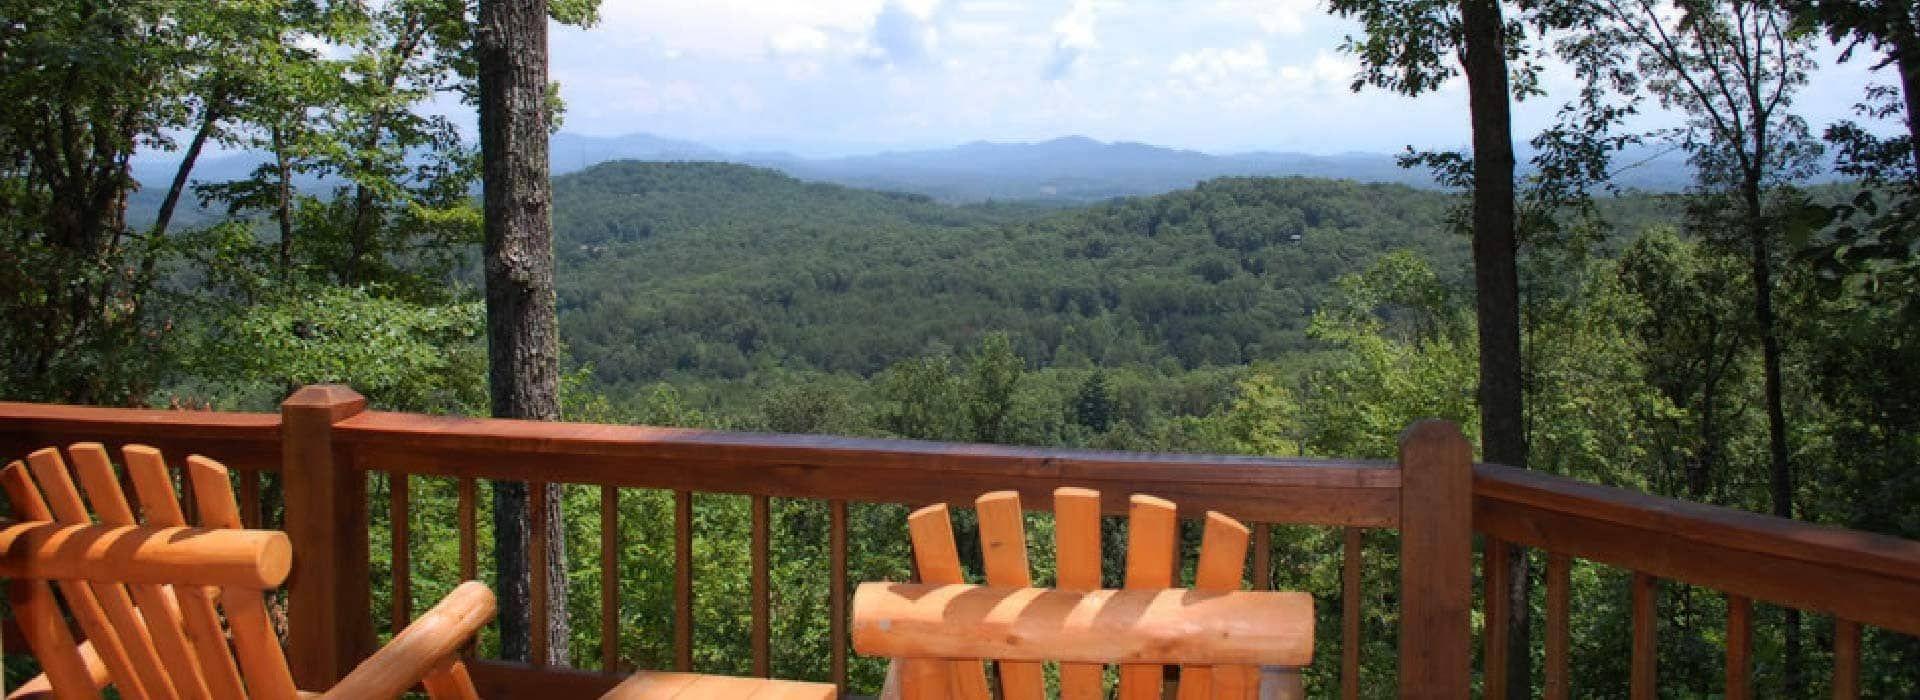 Ordinaire Affordable Cabin Rentals Blue Ridge GA | Cheap Blue Ridge Cabin Rentals